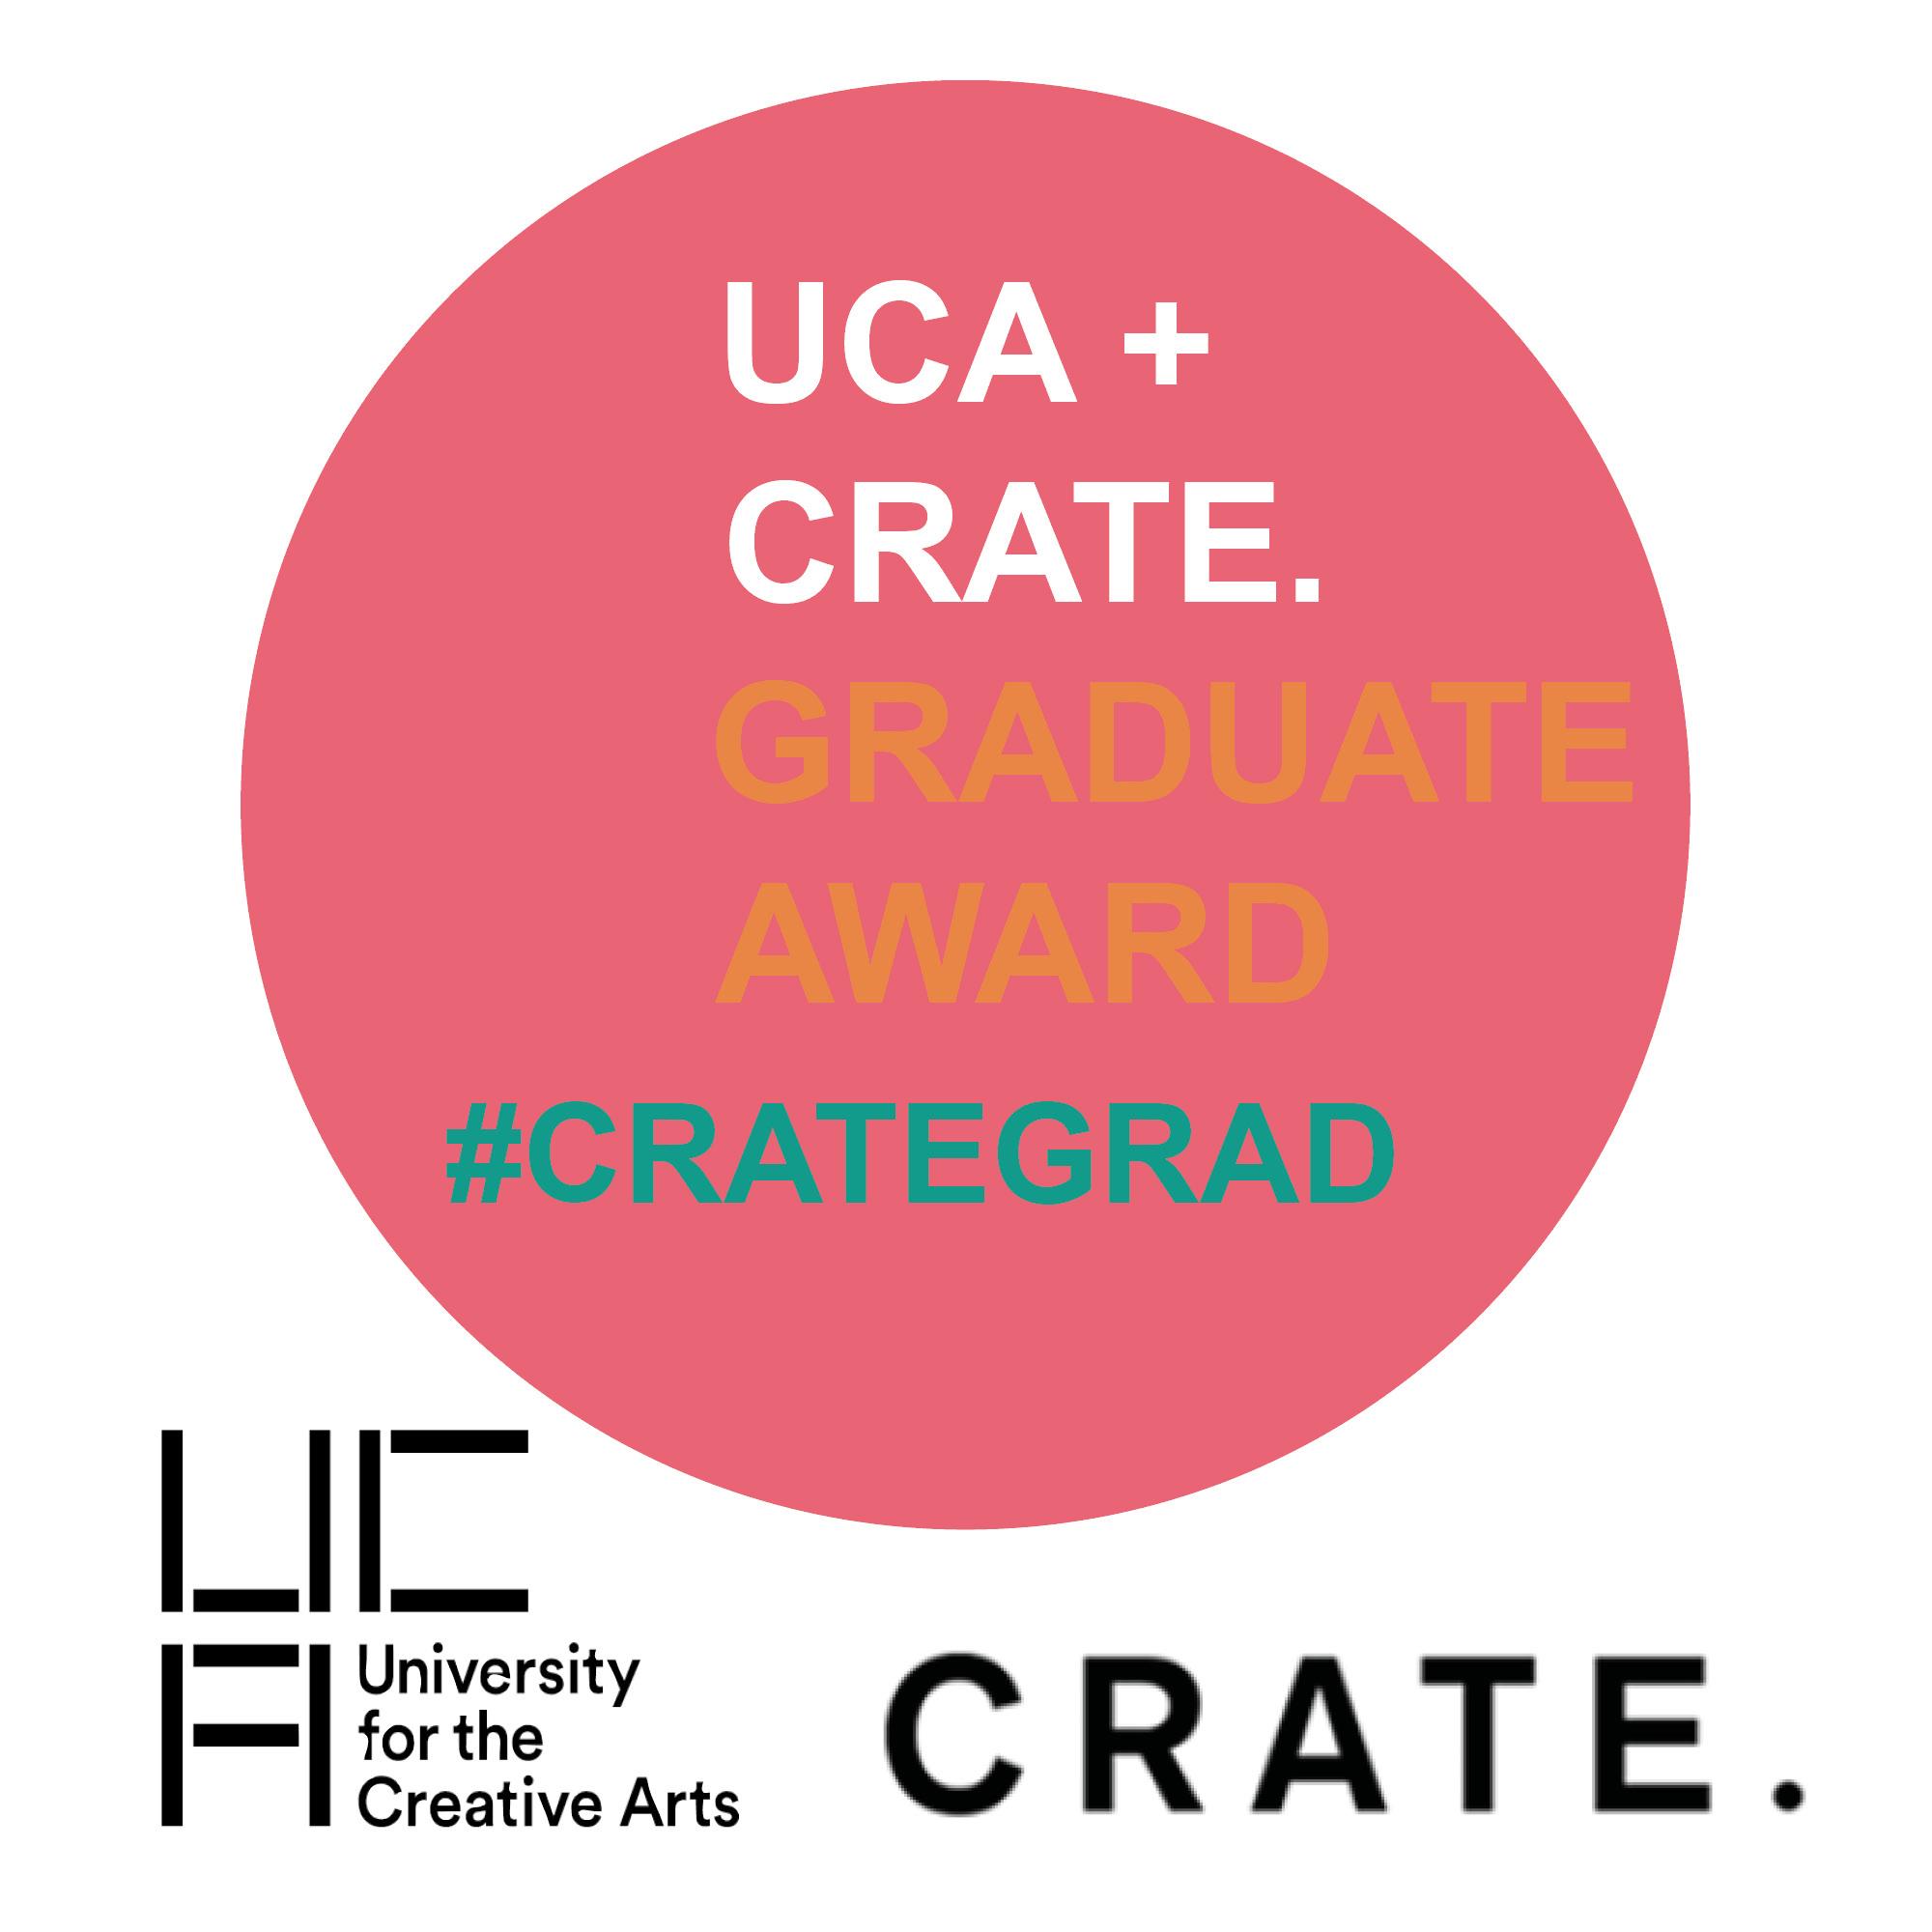 Grad-award-image